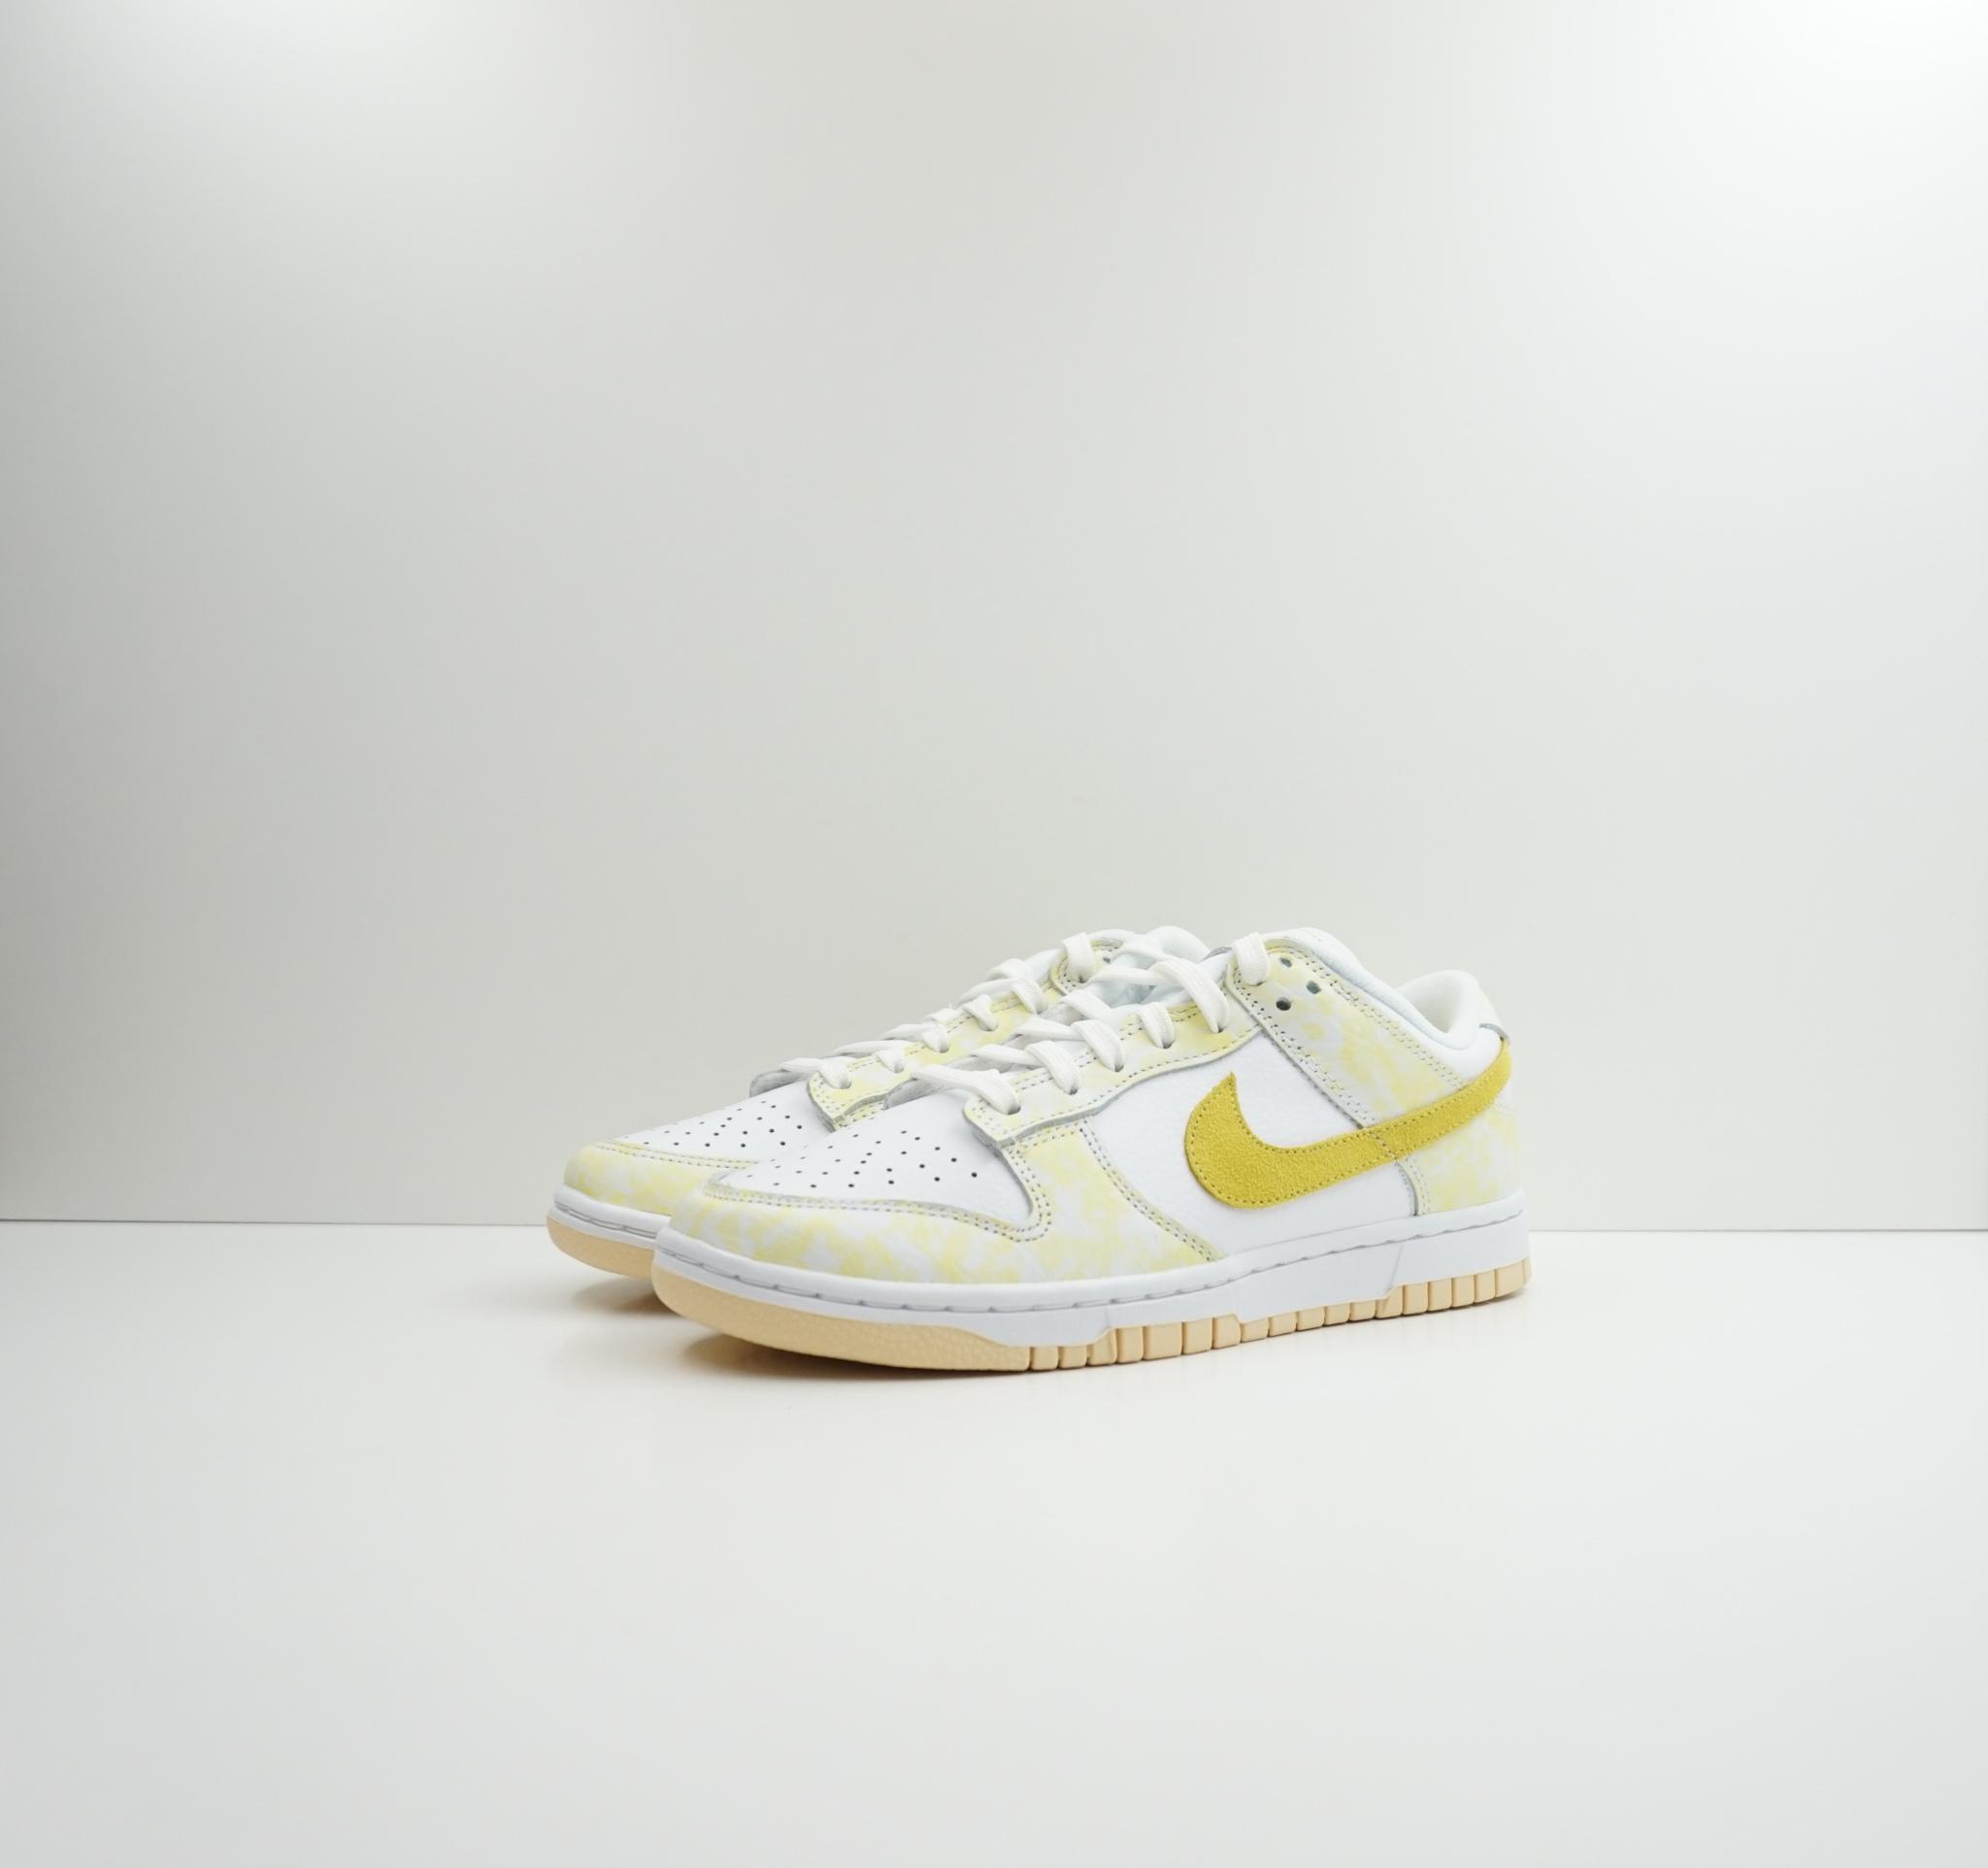 Nike Dunk Low Strike Yellow (W)